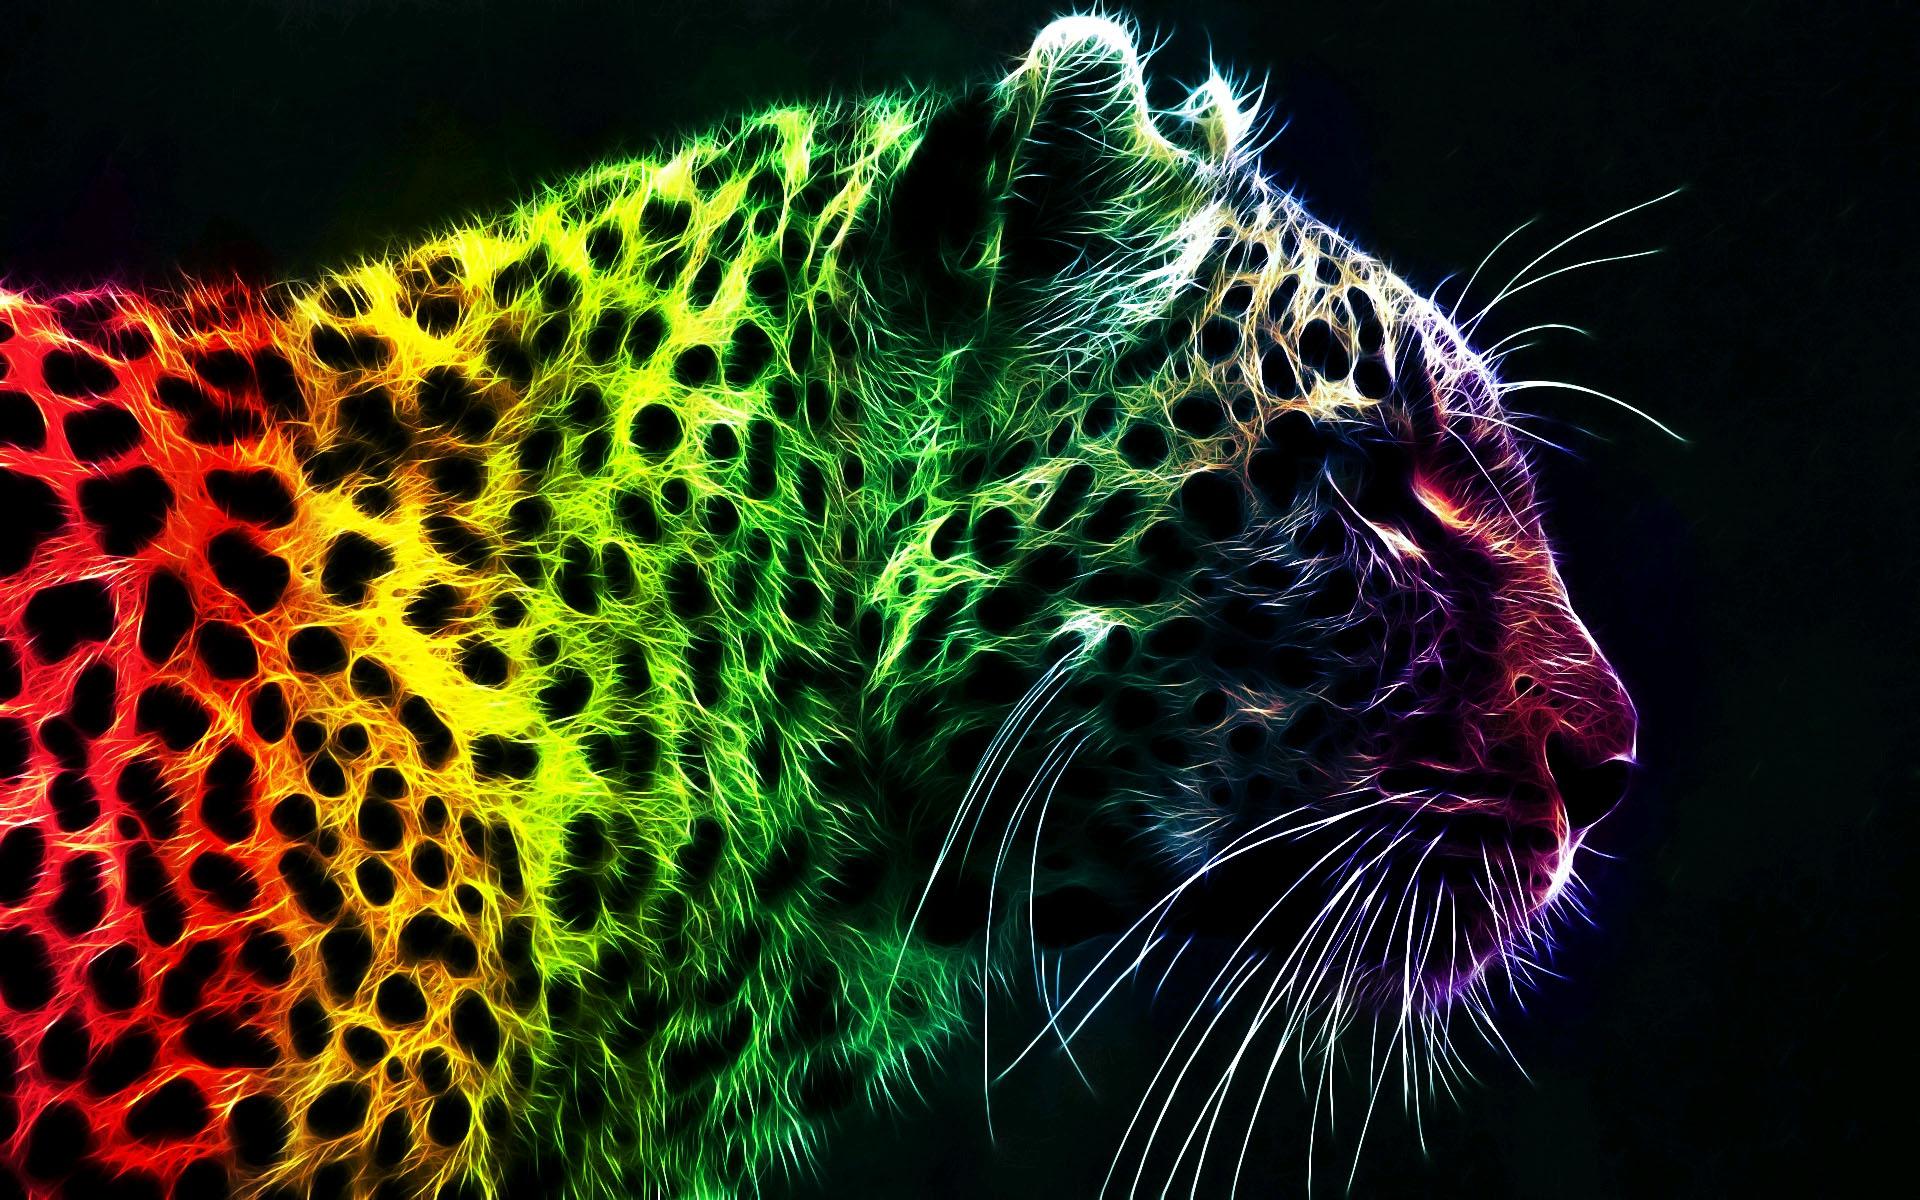 Colorful Leopard Backgrounds wallpaper Colorful Leopard Backgrounds 1920x1200